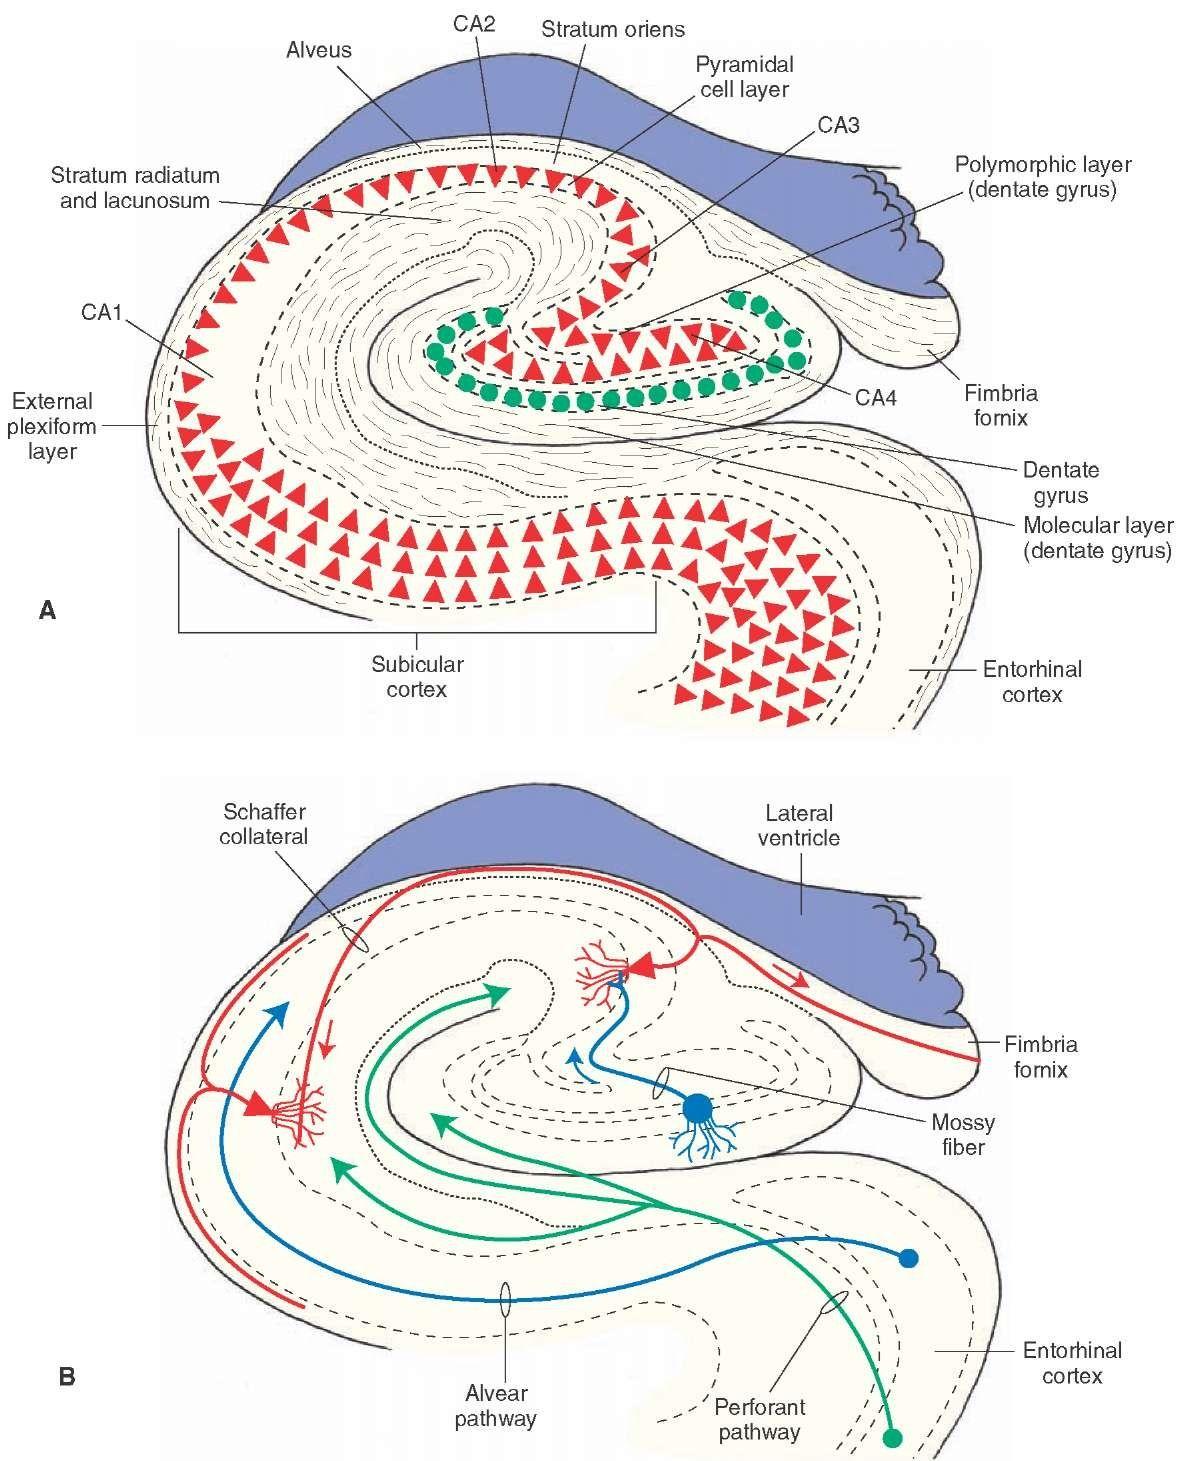 Hippocampus Anatomy Google Search Systems Anatomy Diagram Brain